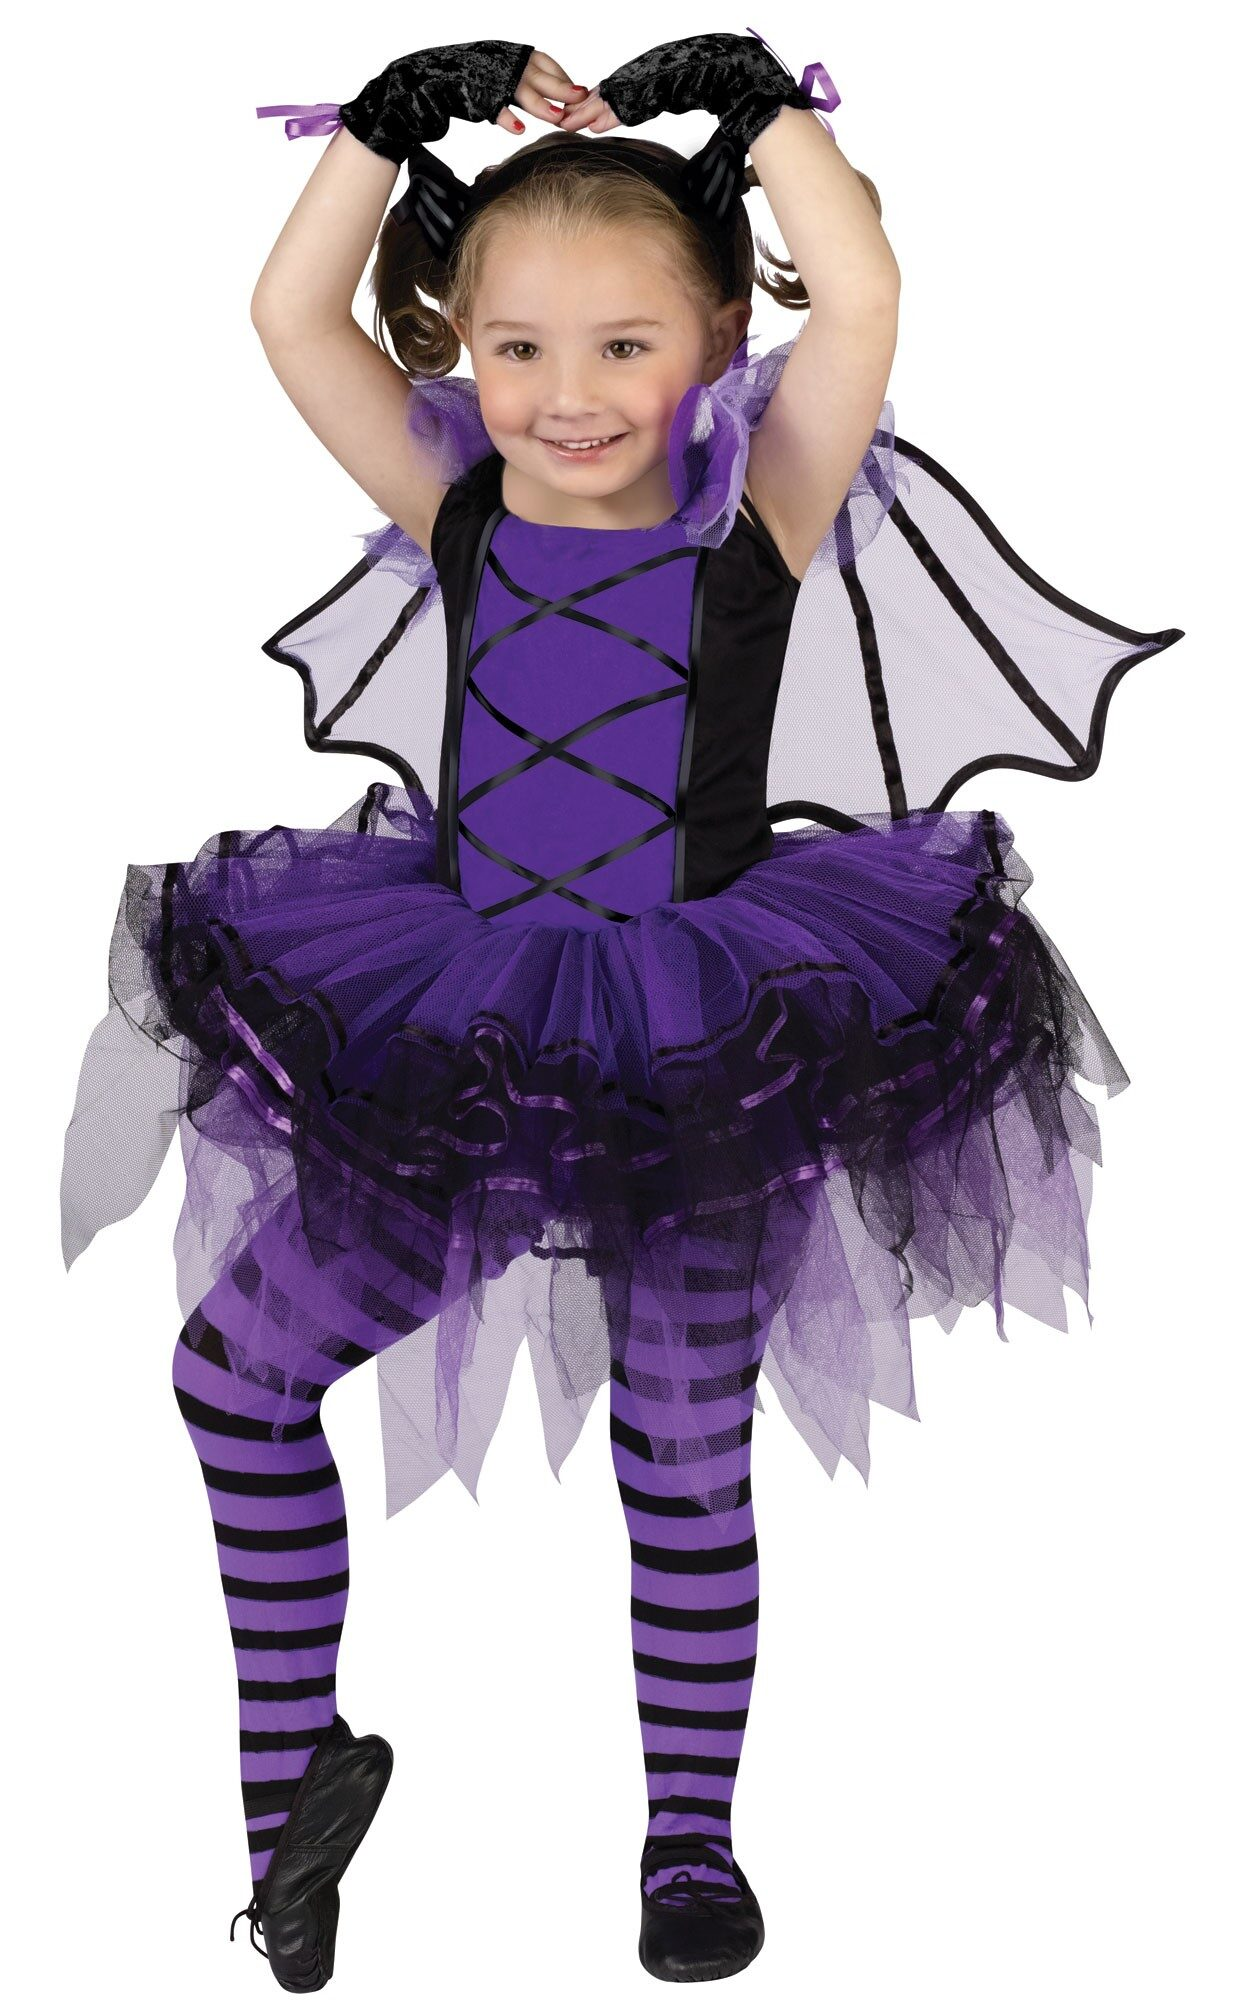 Kids Batarina Bat Toddler Costume - Mr. Costumes